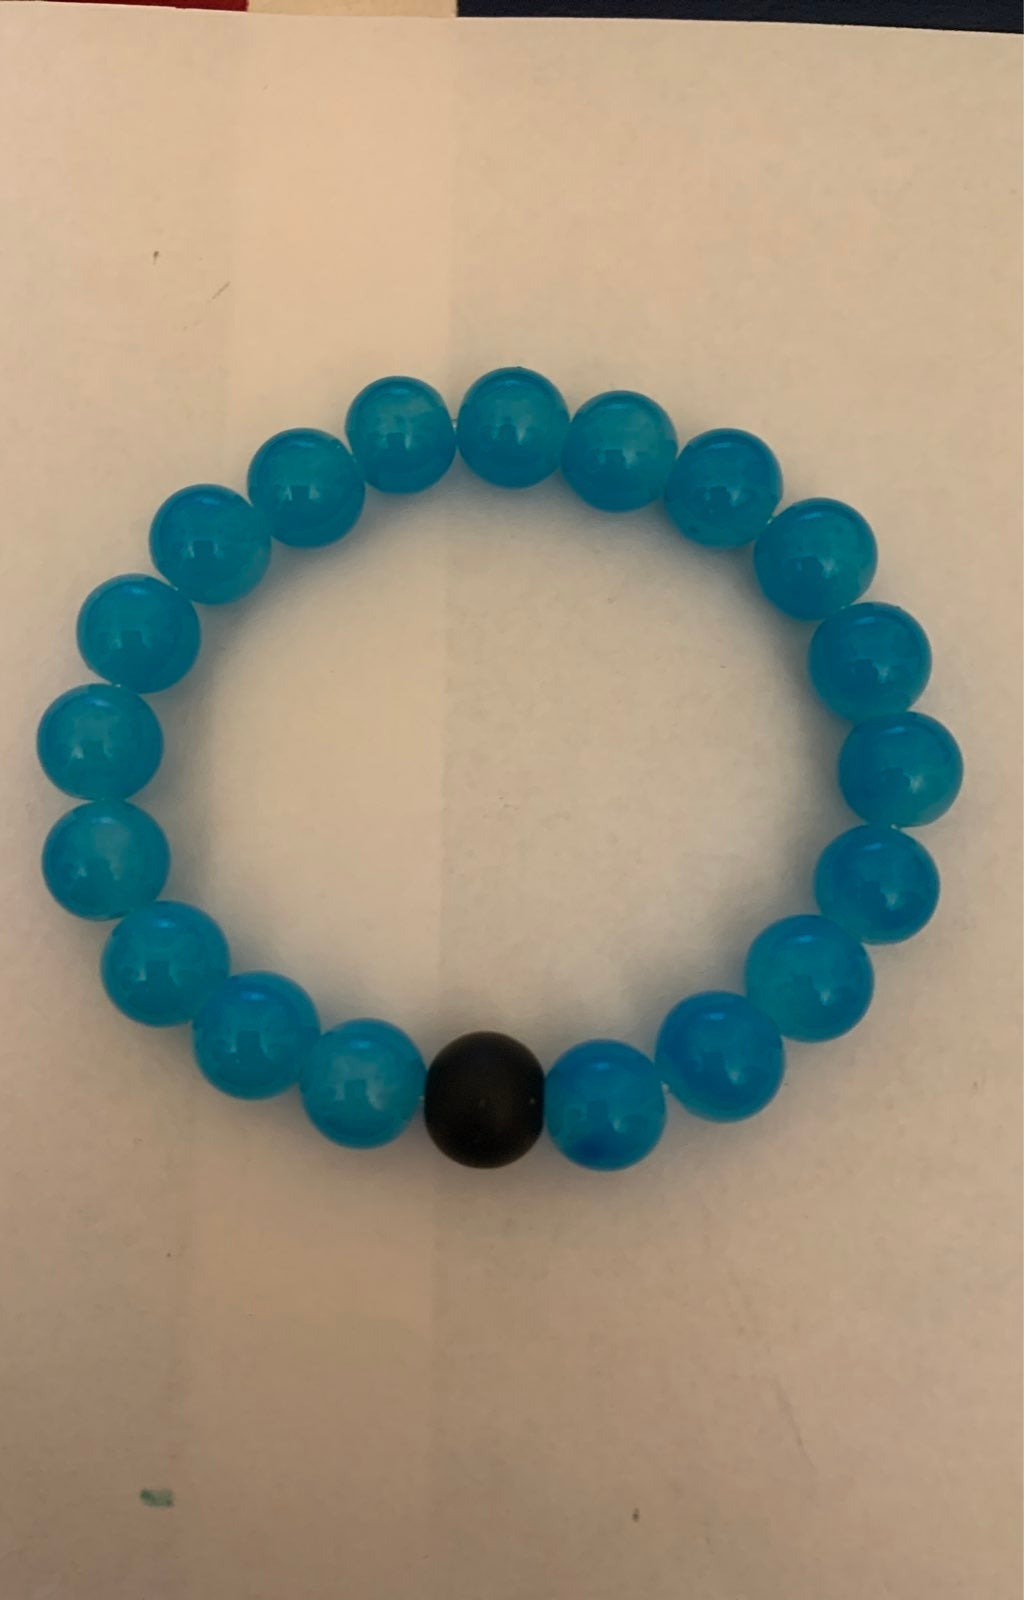 Spencer's Bracelet